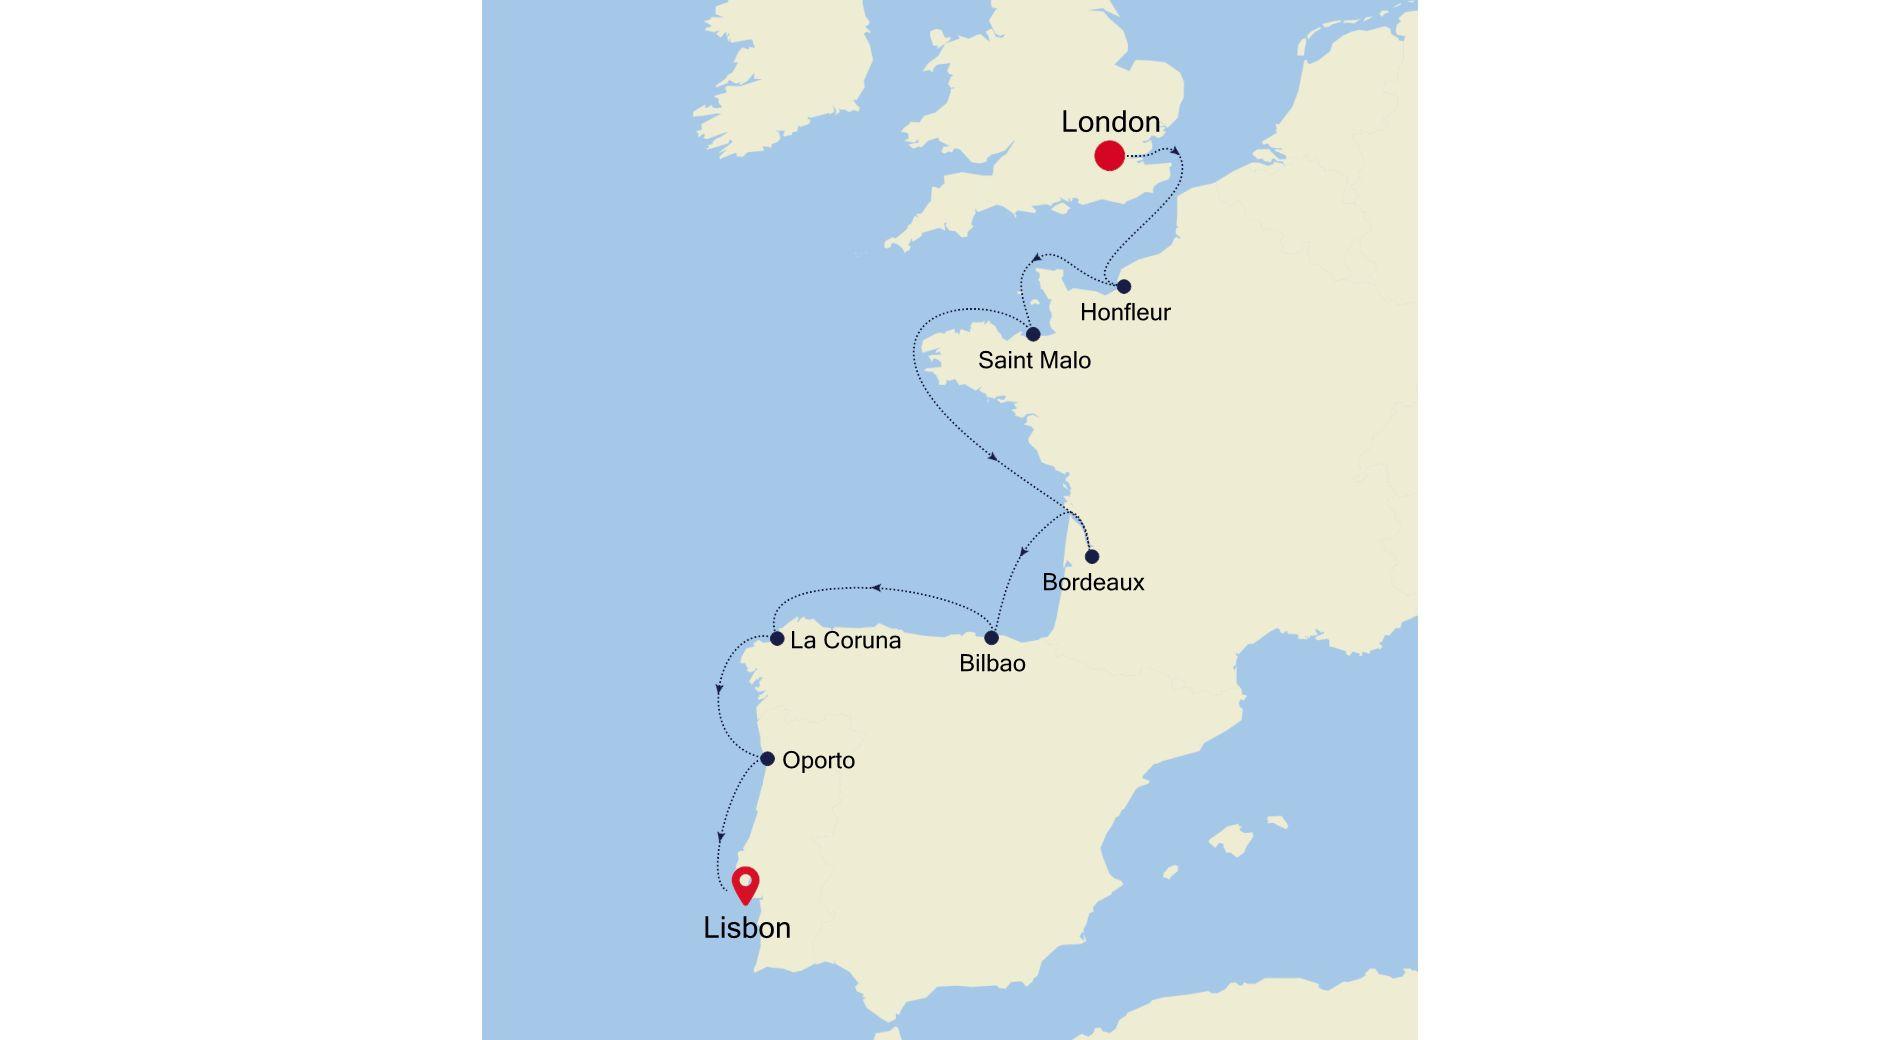 SL200914011 - London to Lisbon